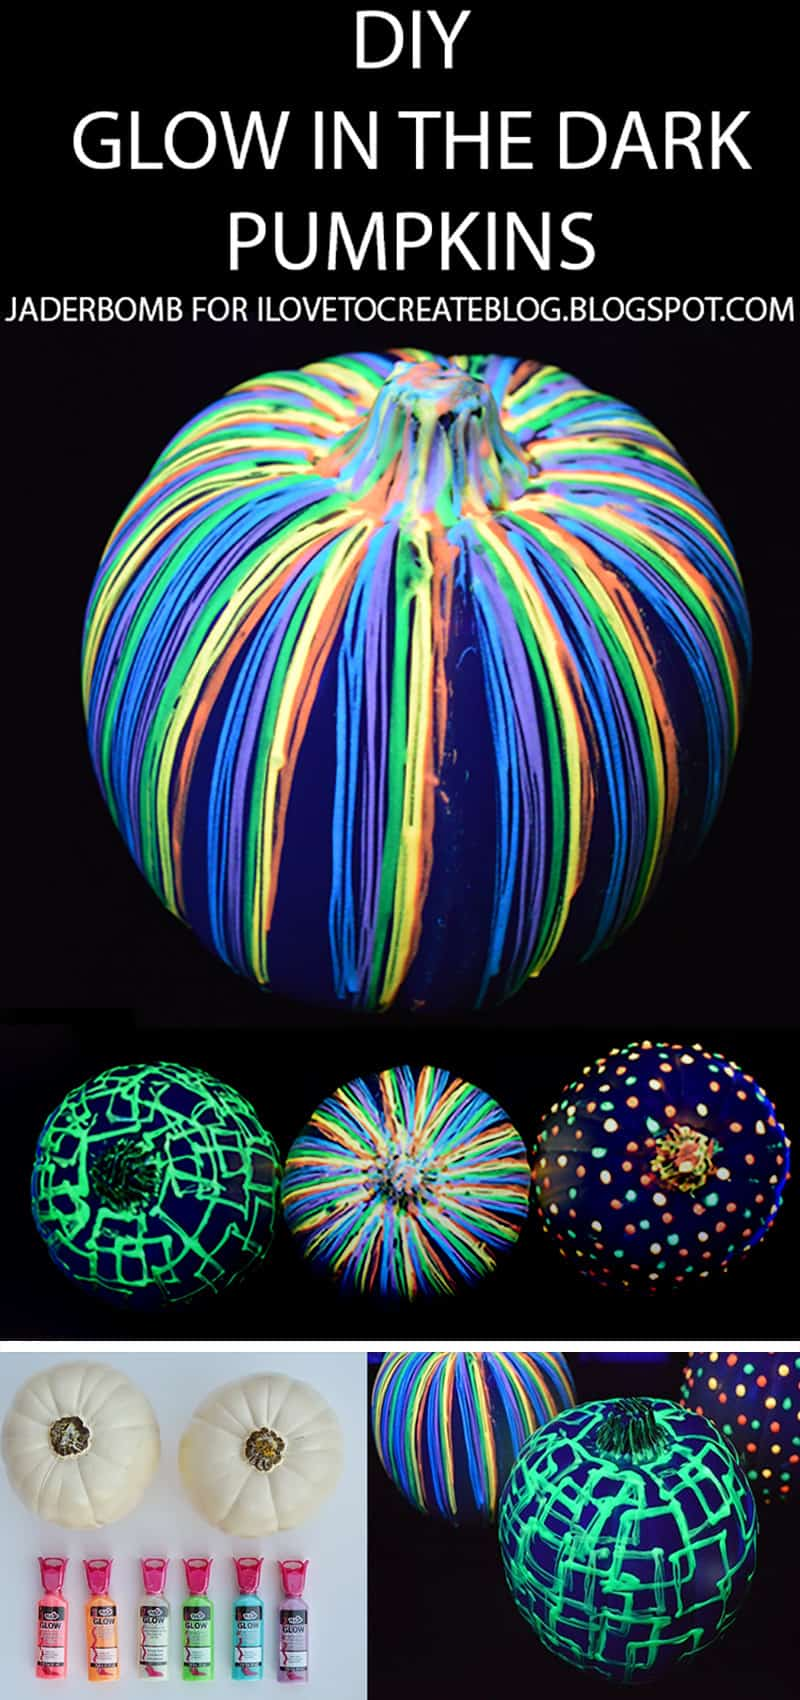 diy-glow-in-the-dark-pumpkins